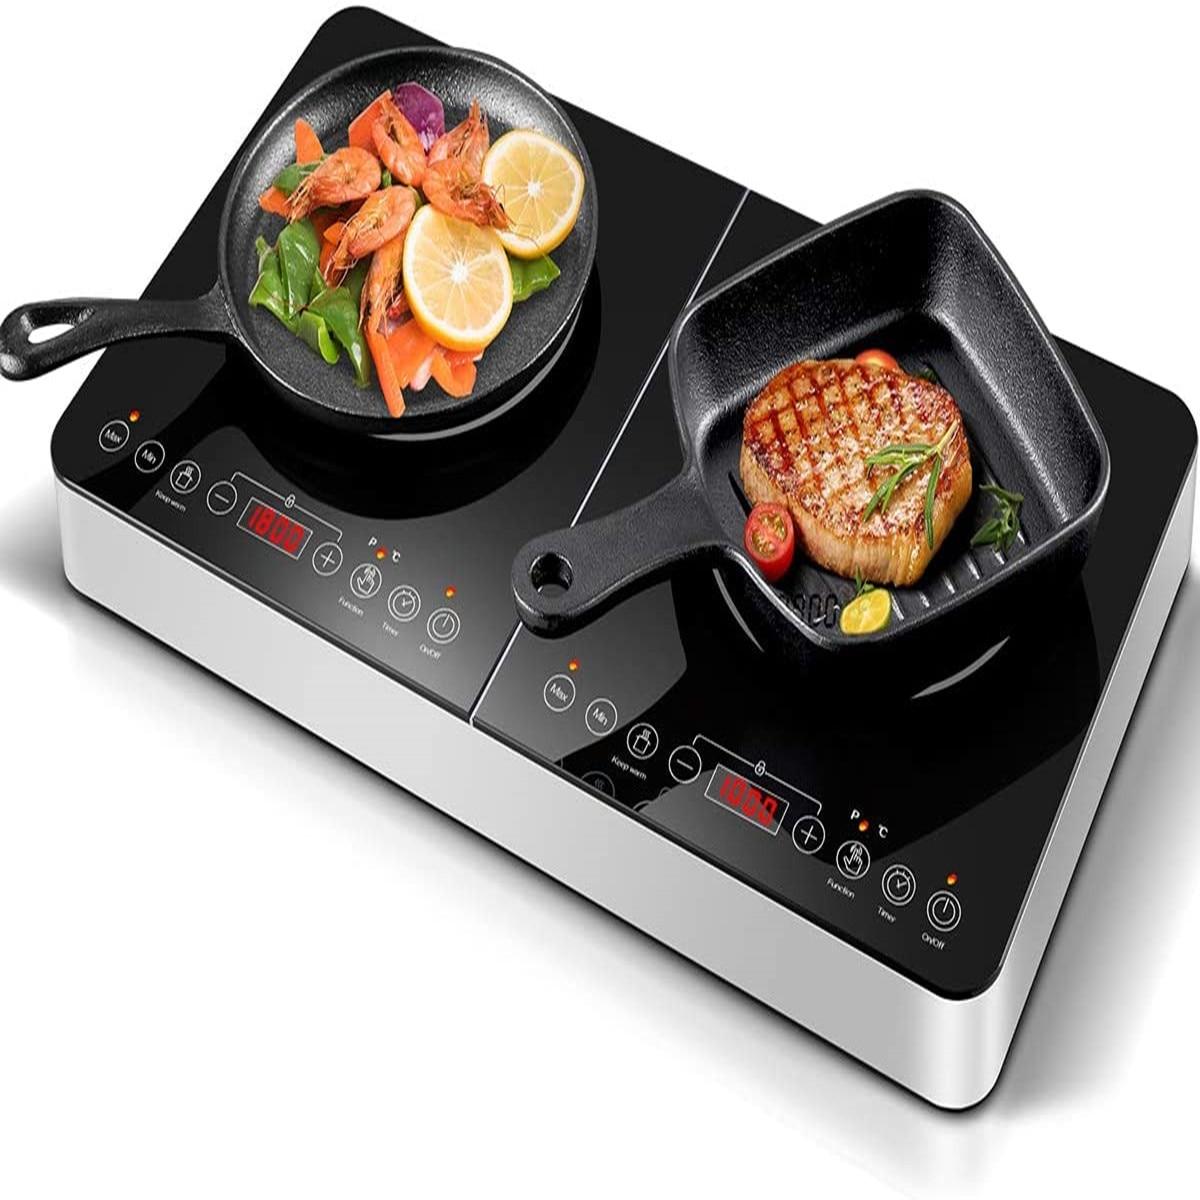 Aobosi موقد الإحماء مزدوج التعريفي طباخ لوحات التعريفي الكهربائية 3500 واط 4 ساعة وظيفة الموقت